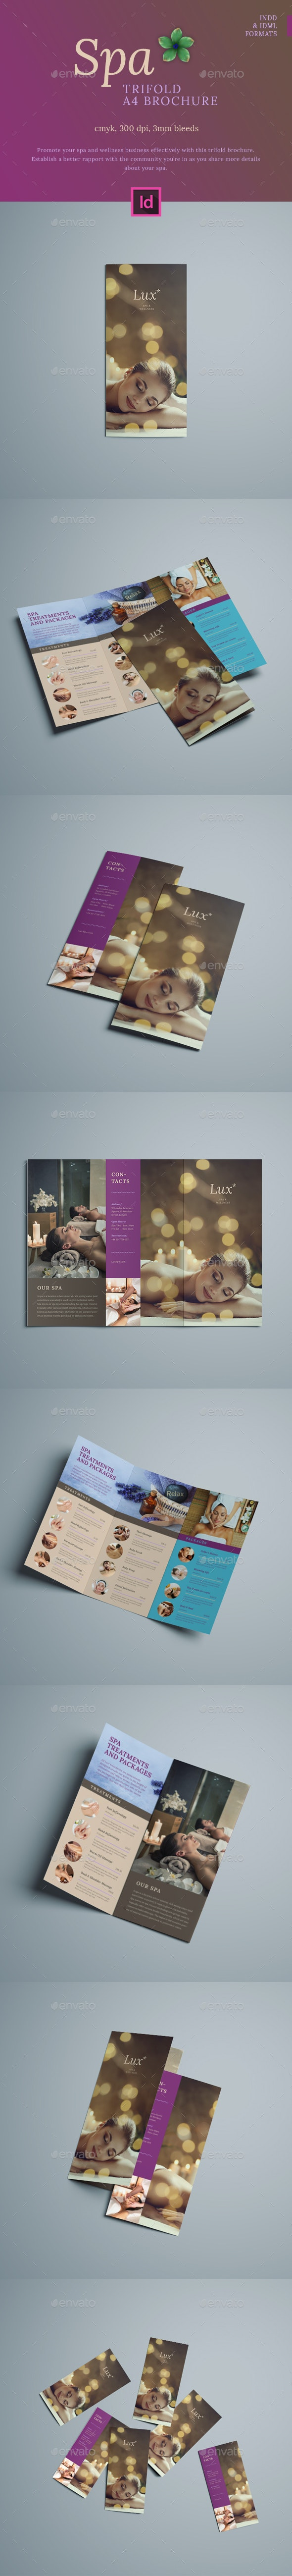 Spa Trifold A4 Brochure - Brochures Print Templates